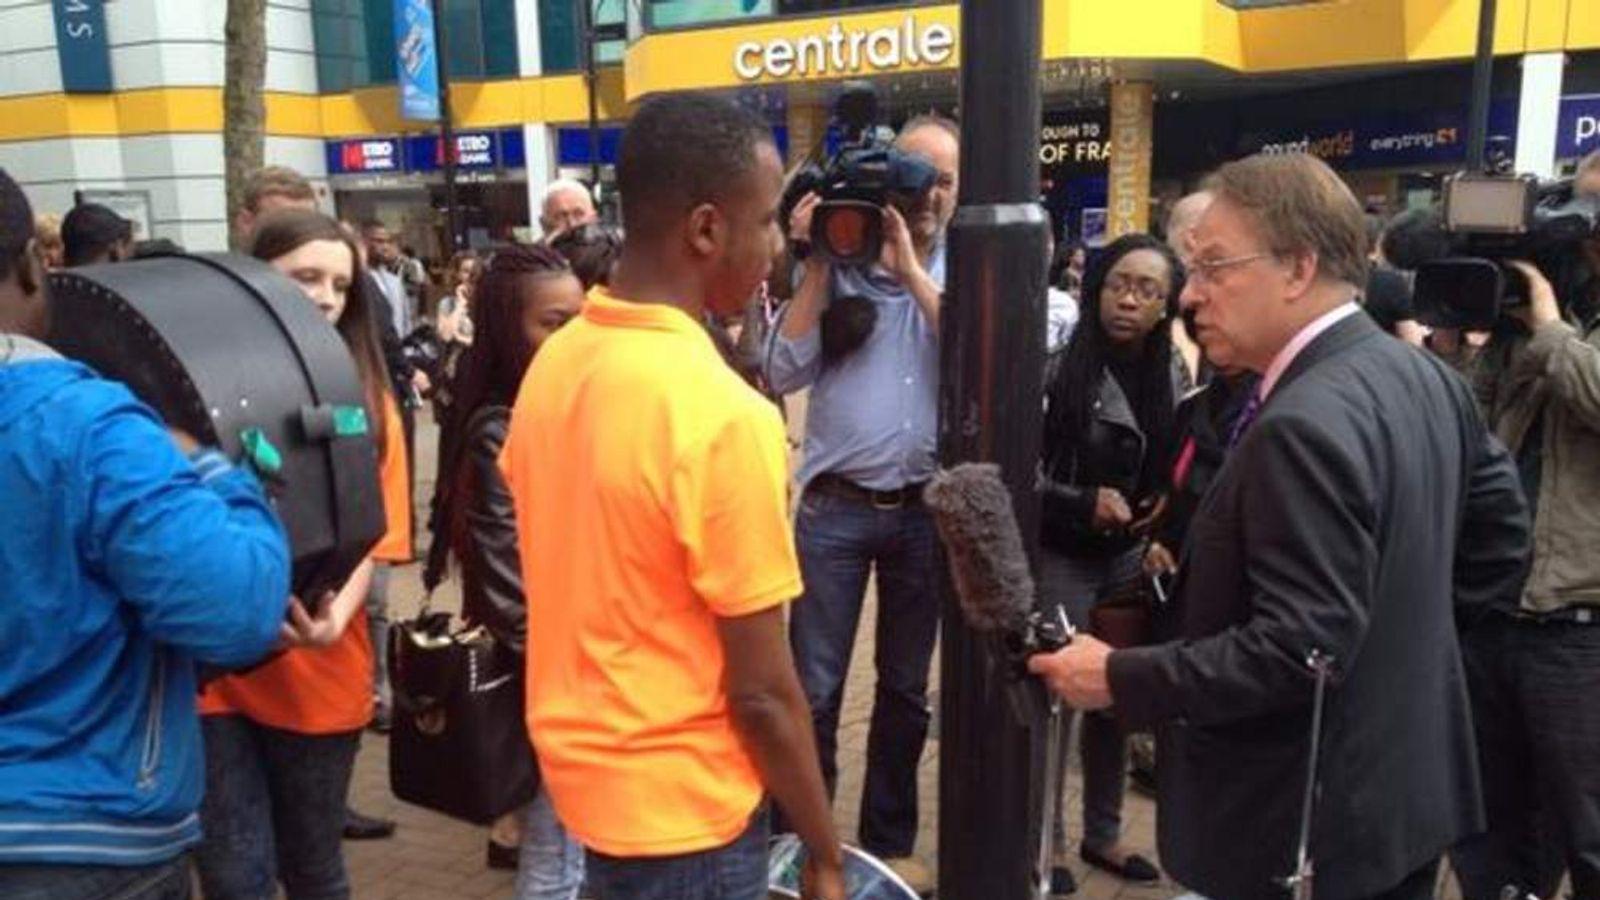 Steel band stops playing for UKIP in Croydon